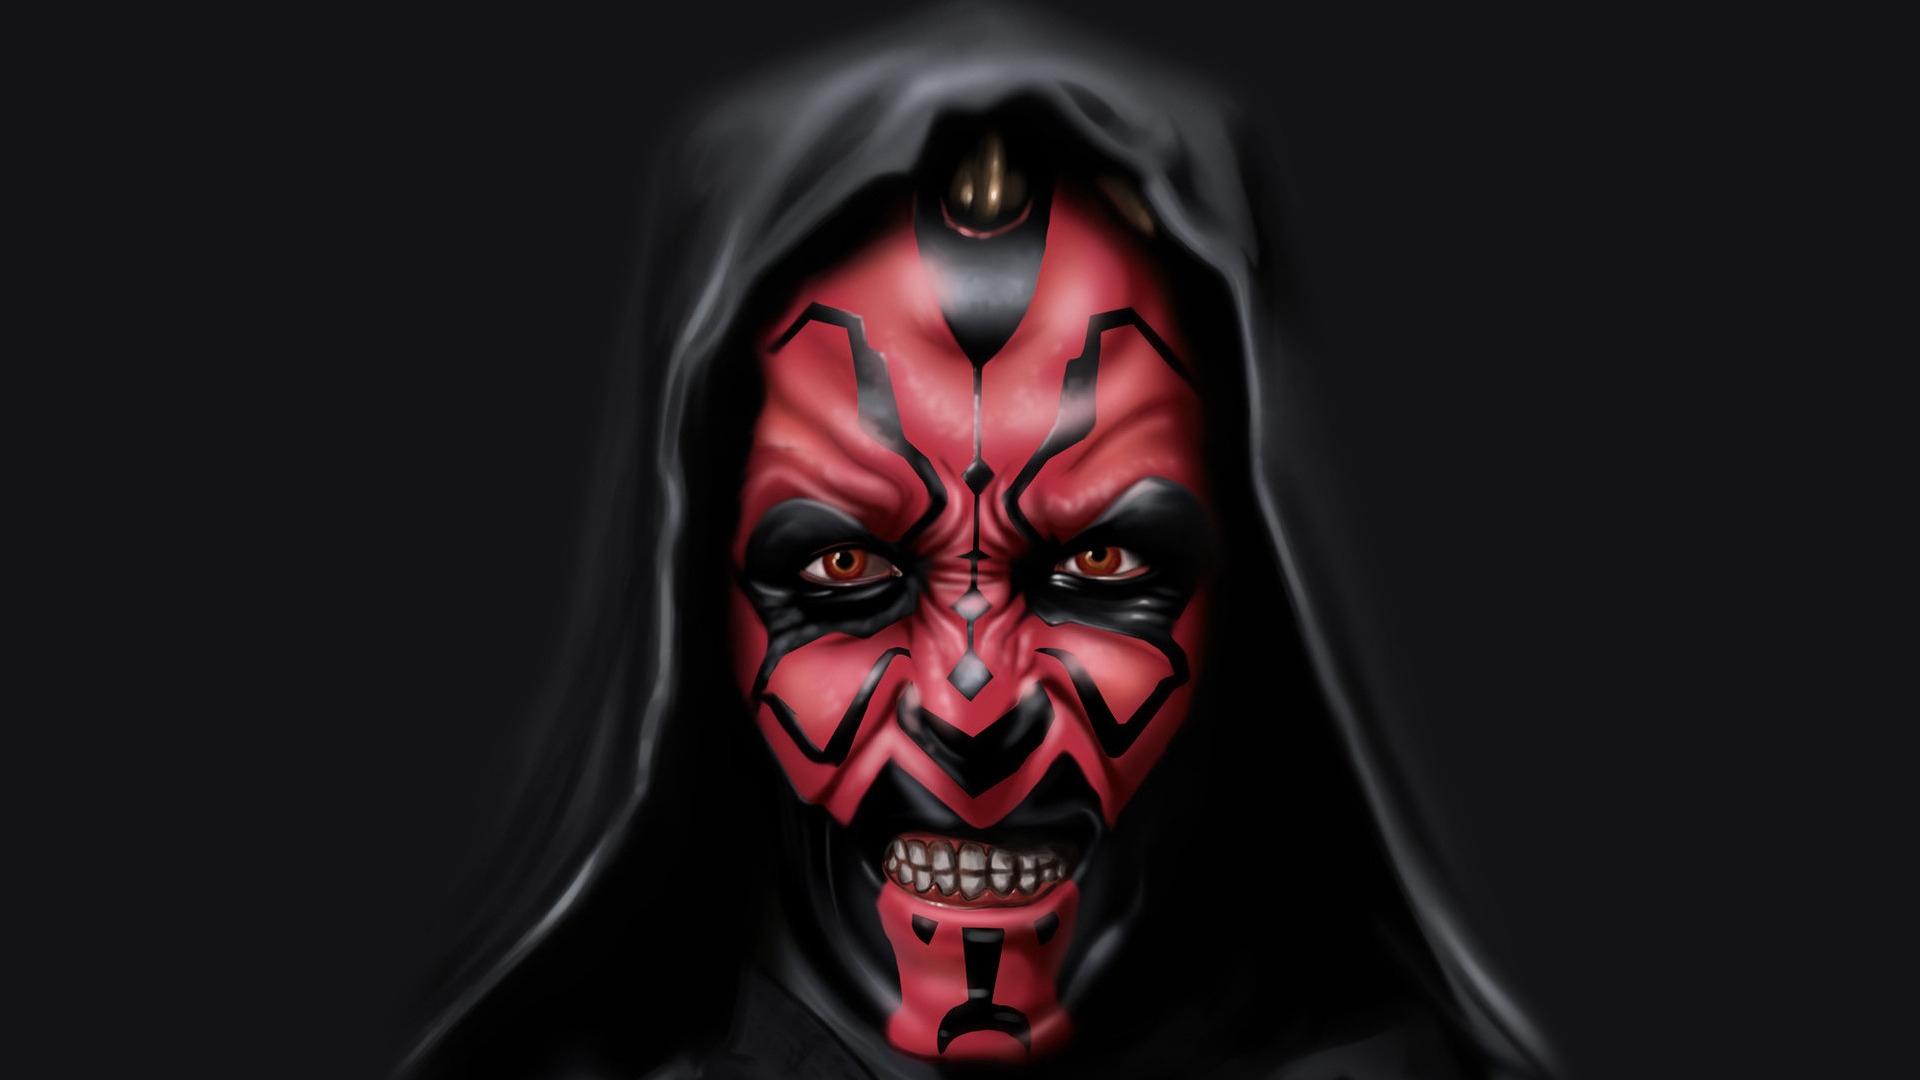 Darth Vader Animated Hd Wallpaper Wallpaperfx